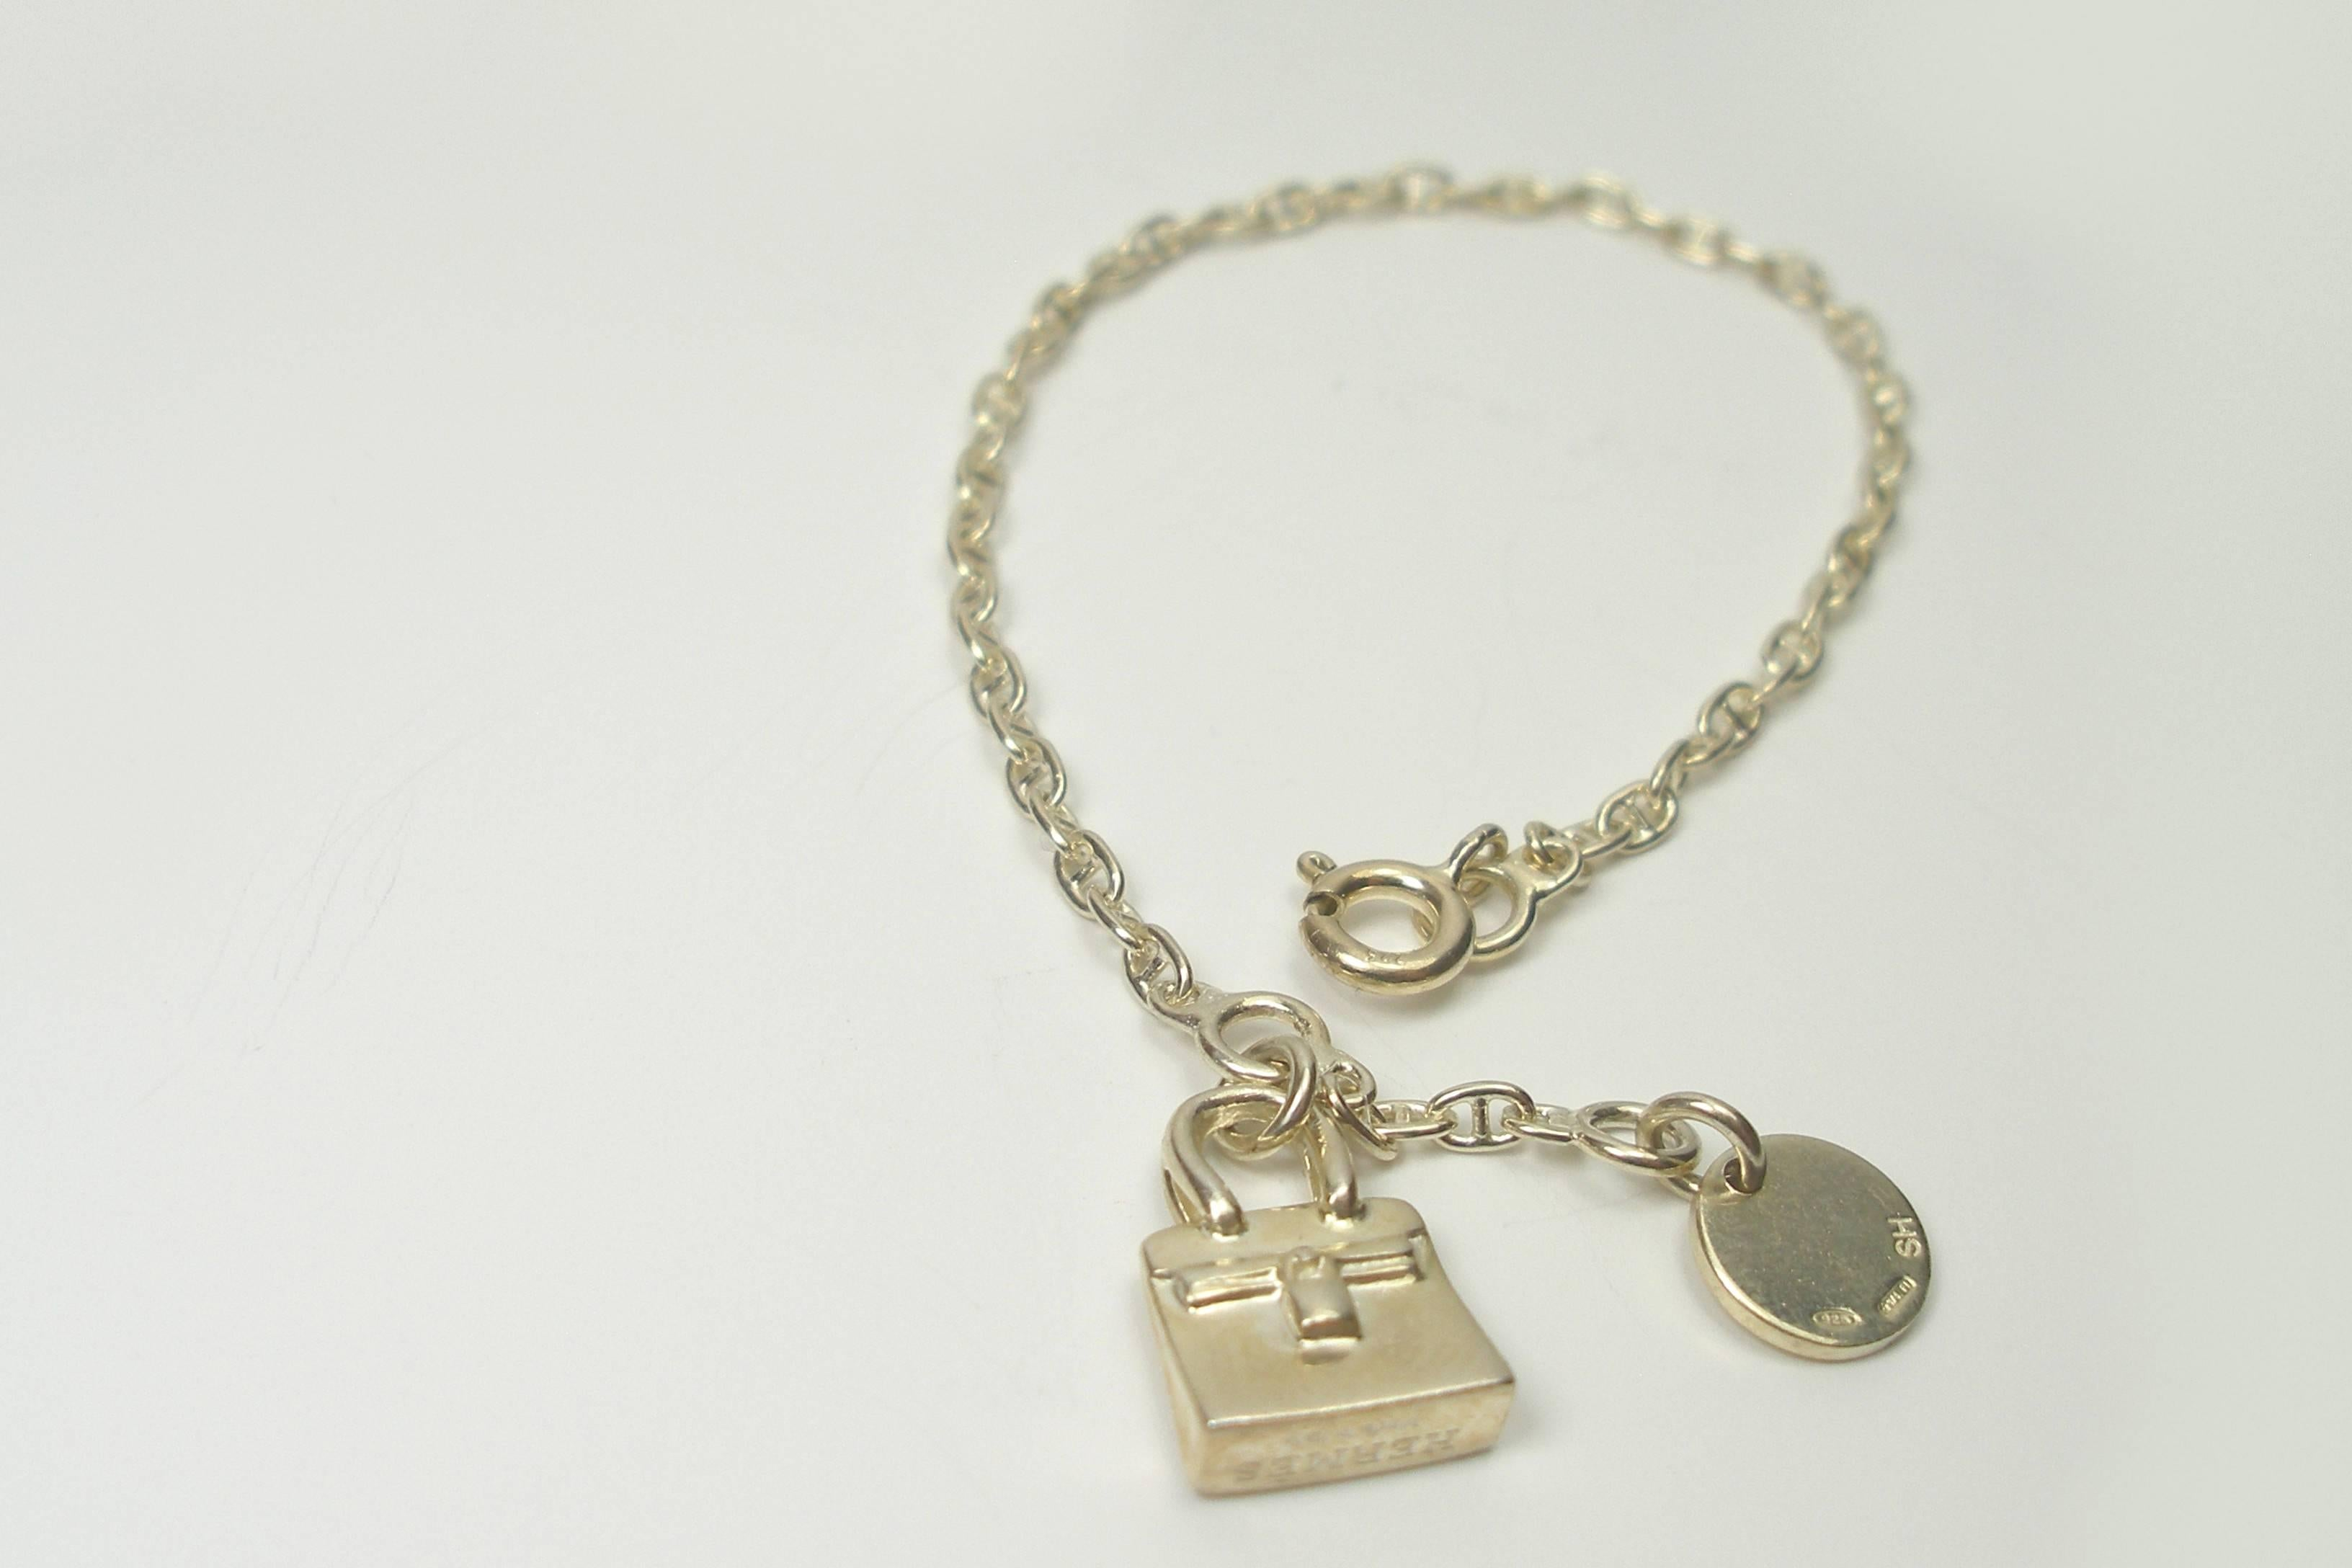 1563d363627 ... clearance so cute hermes vintage birkin charm silver chaine dancre  bracelet silver 925 in good 7d996